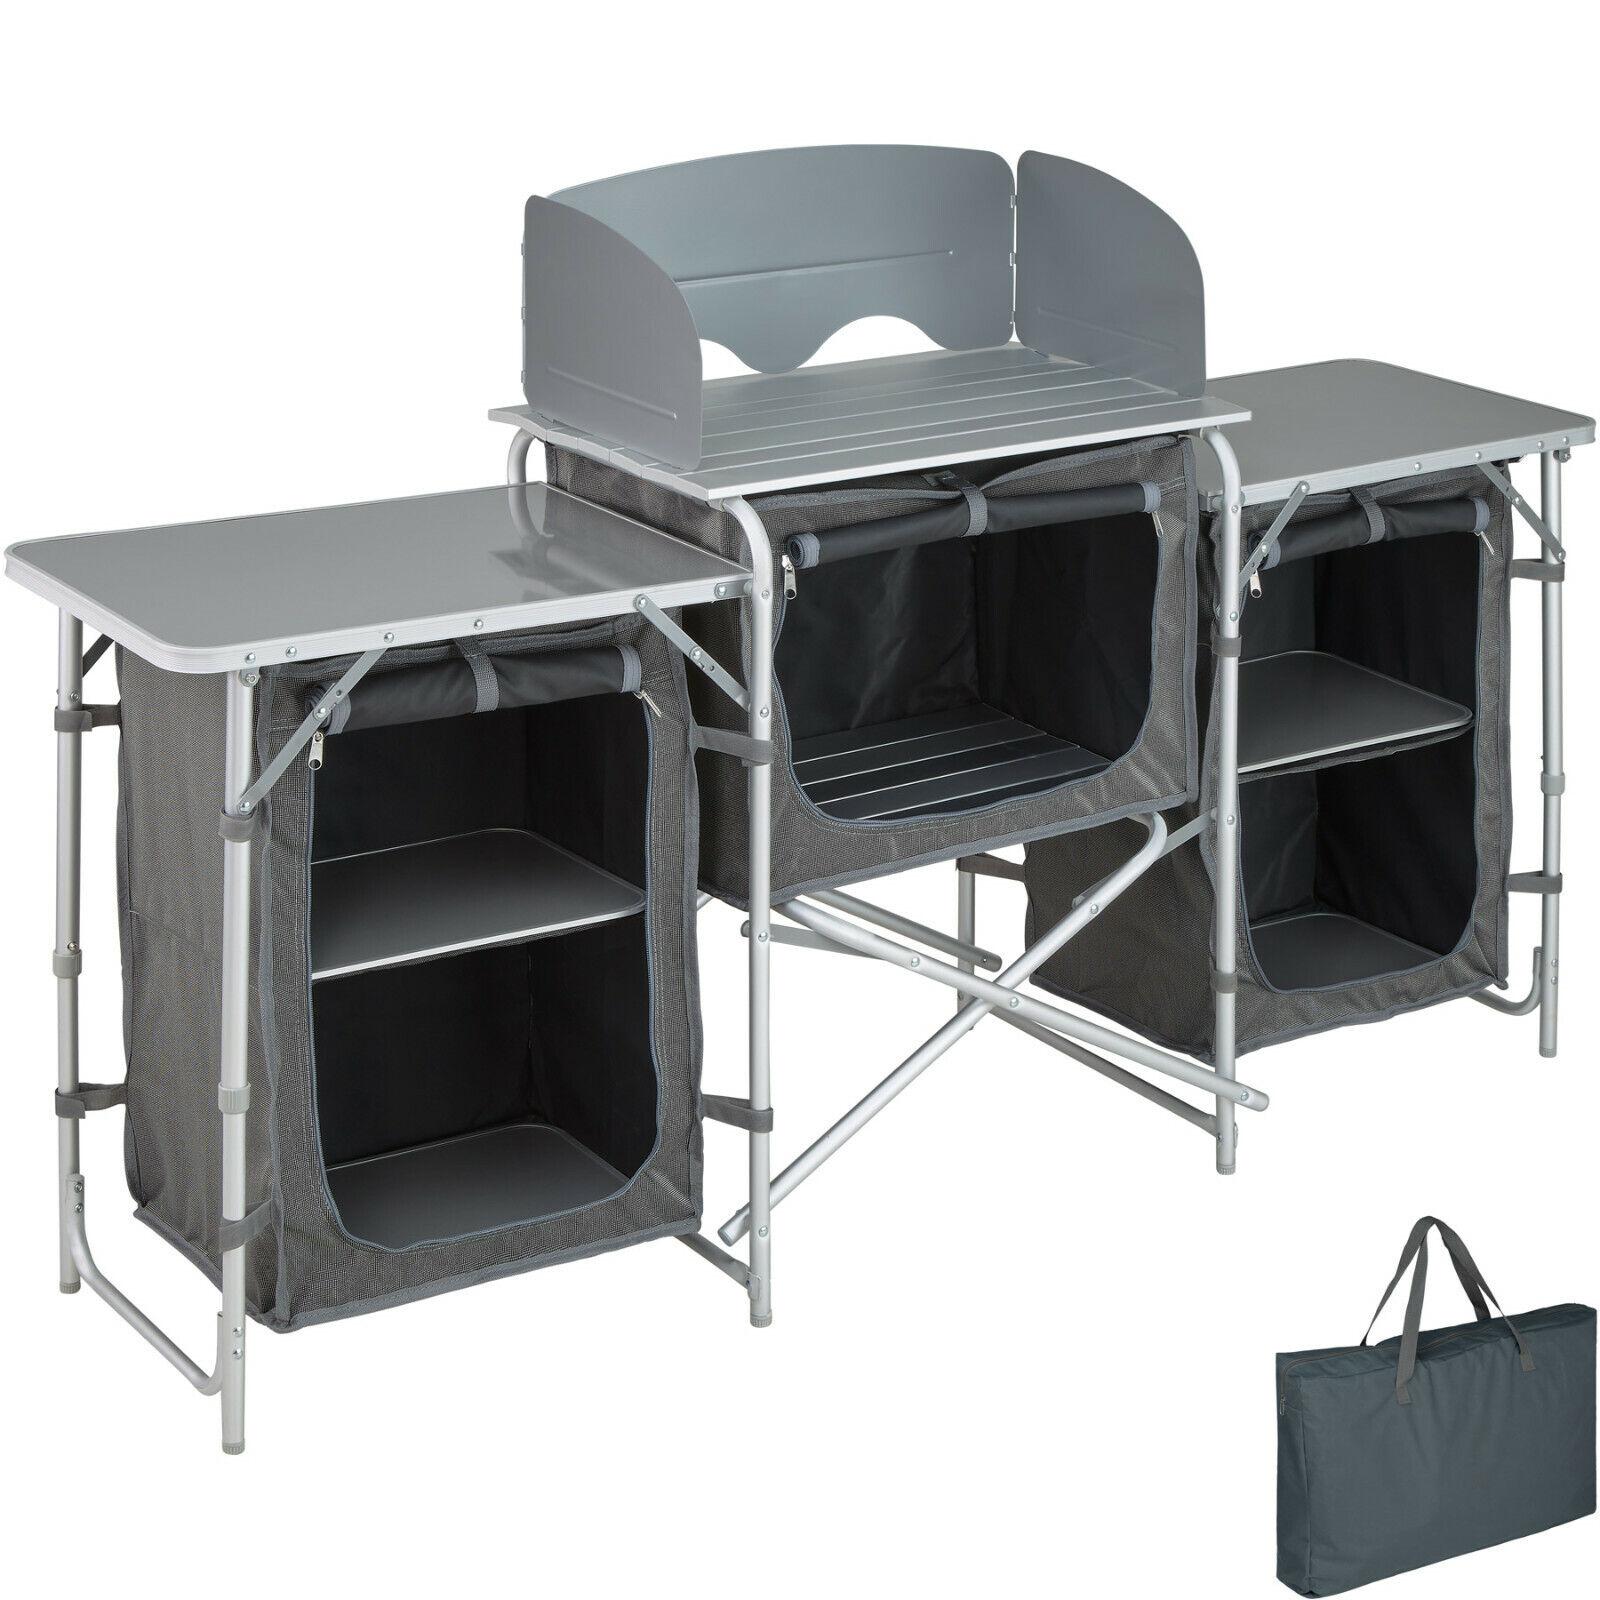 Cocina de Camping Aluminio Compartimentos Plegable Paravientos 164,5x52x104cm